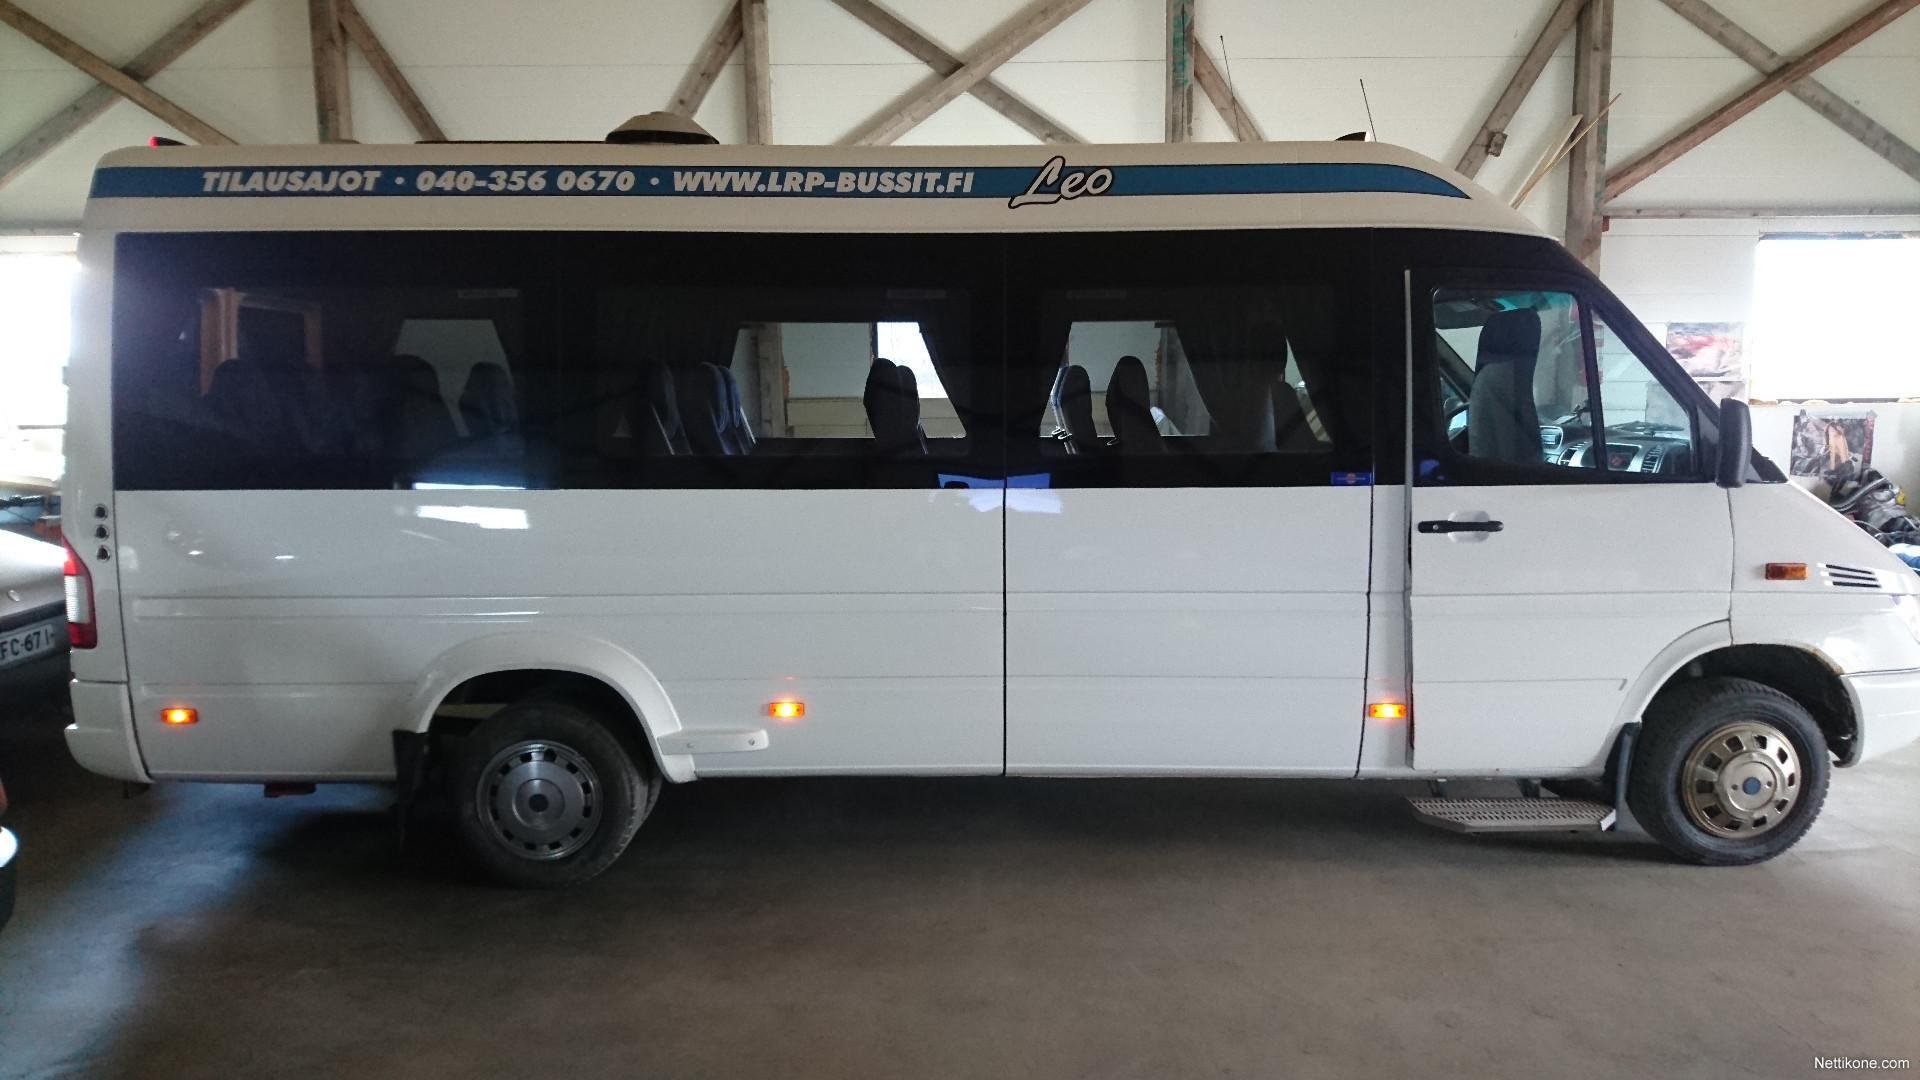 Mercedes-Benz sprinter 416 cdi bus/coach, 2004 - Nettikone